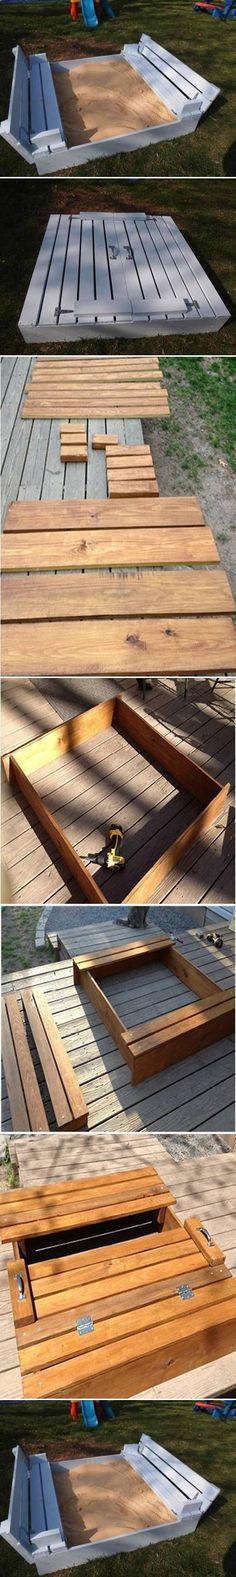 DIY Sandbox - LOVE!